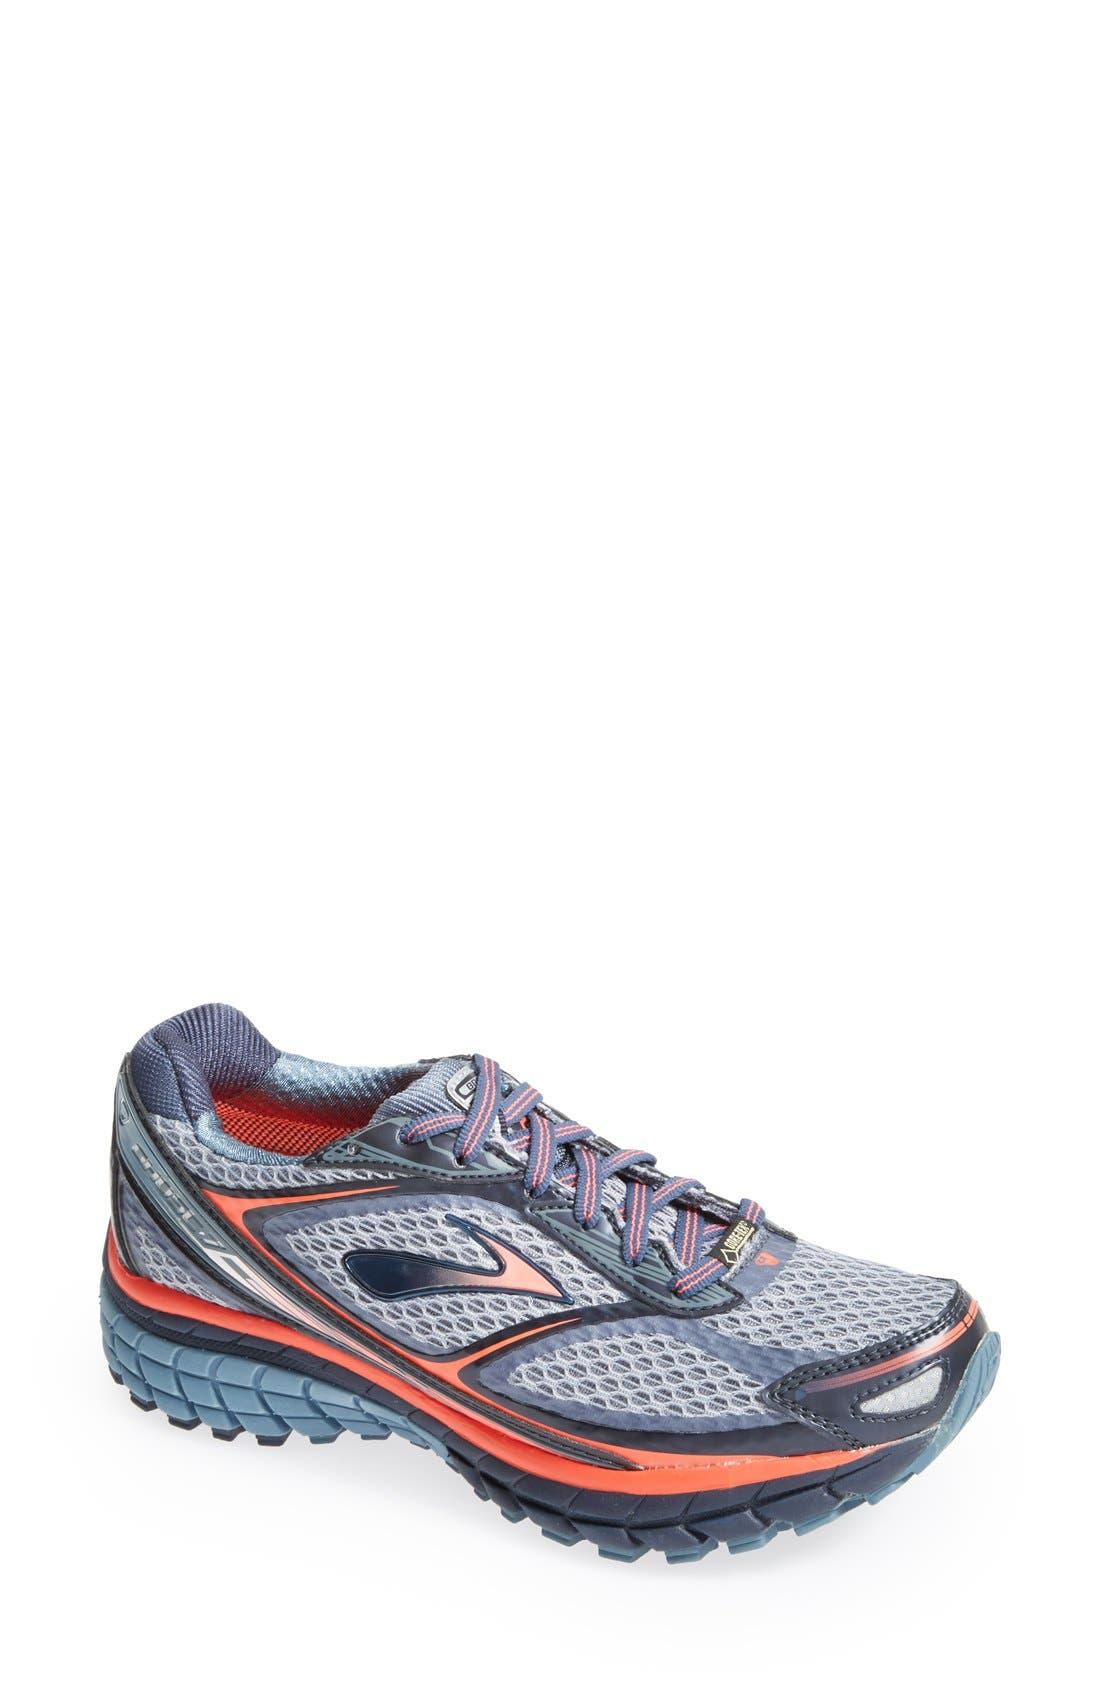 Alternate Image 1 Selected - Brooks 'Ghost 7 GTX' Waterproof Running Shoe (Women)